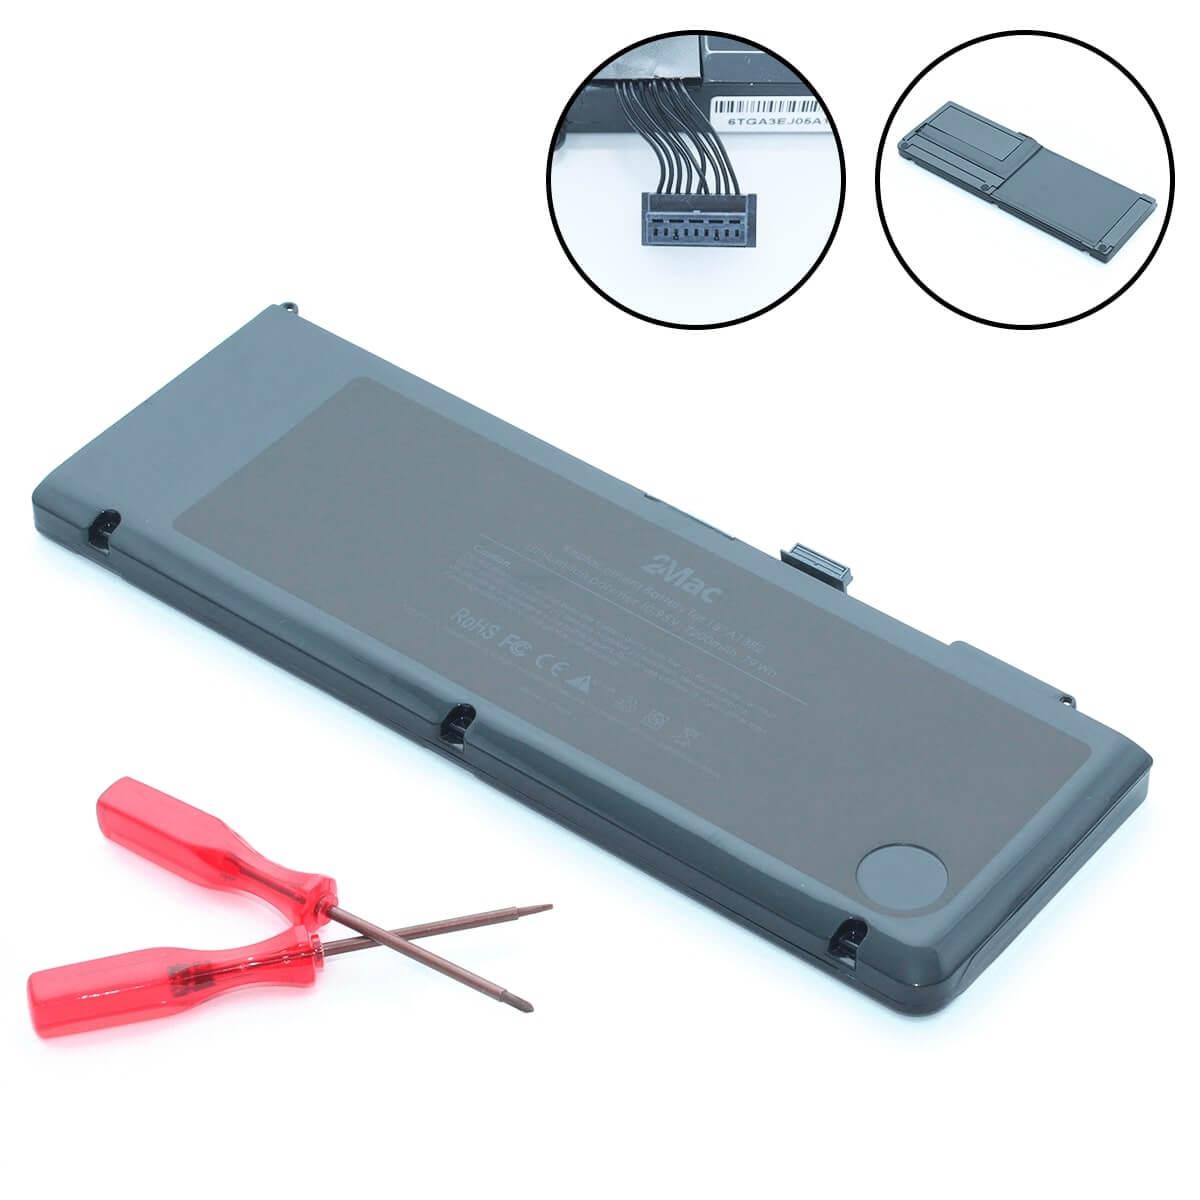 батарея для macbook pro 15 2011, 2012 a1382, батарея для a1286